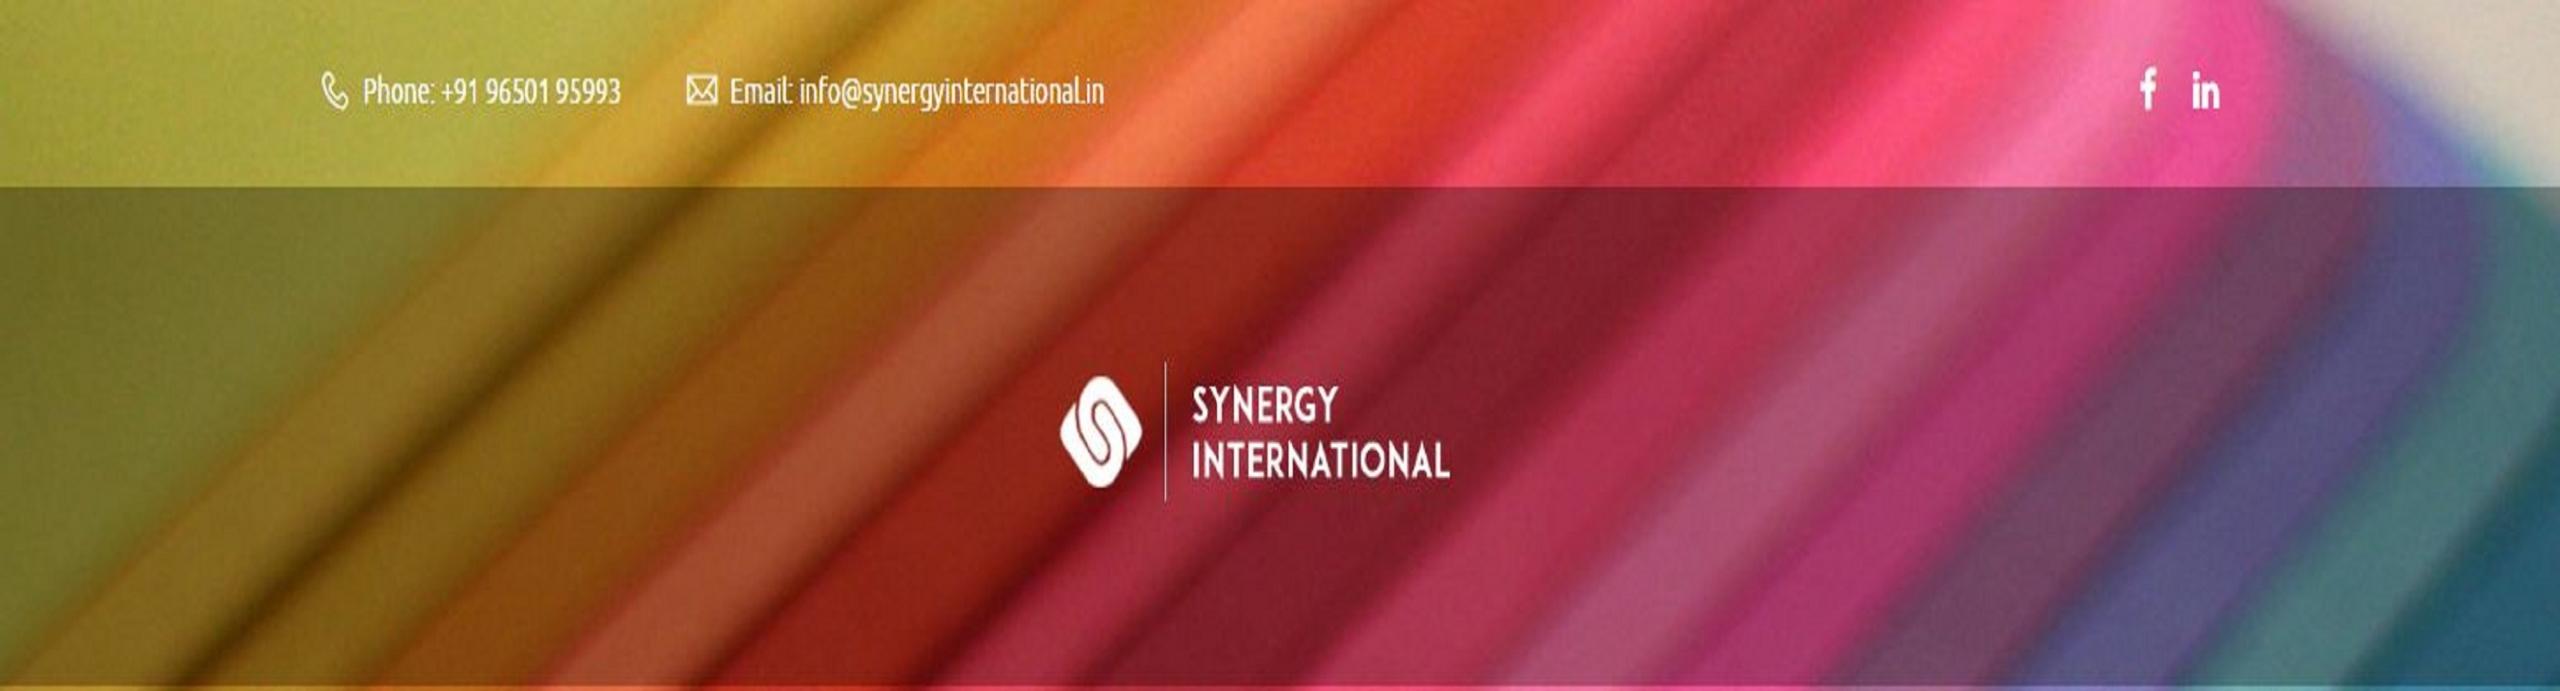 S (@synergyinternational) Cover Image